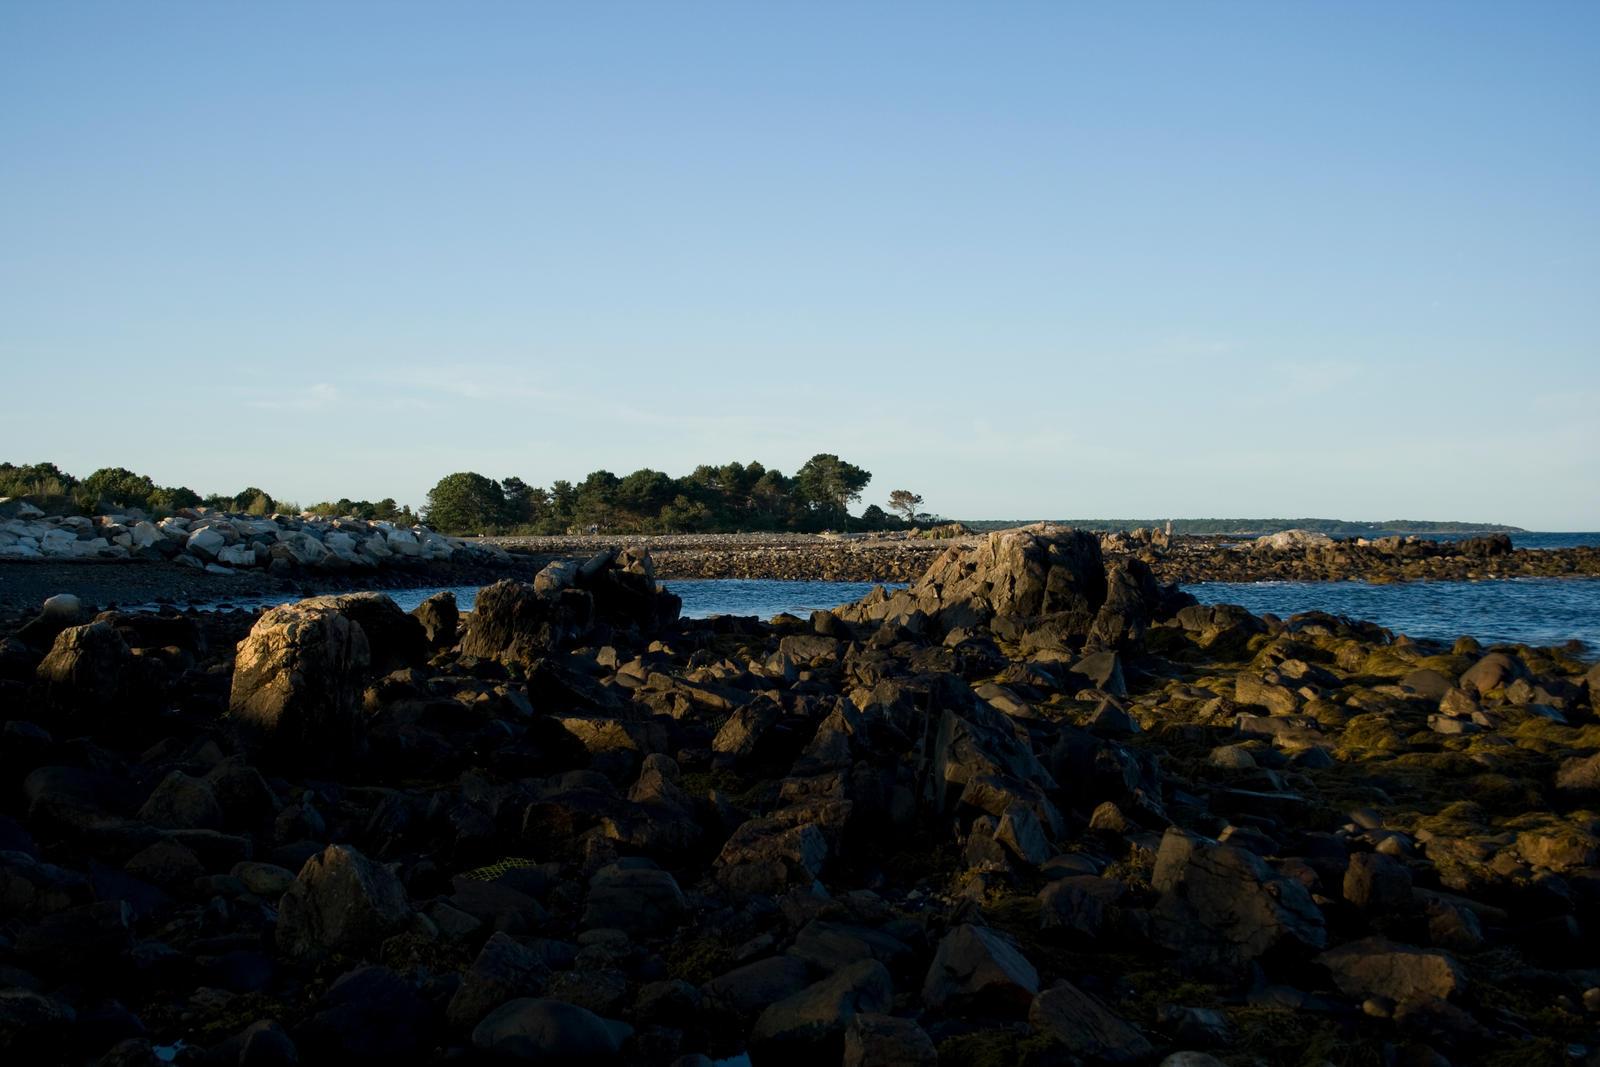 Hampton Beach 6 by megamandos